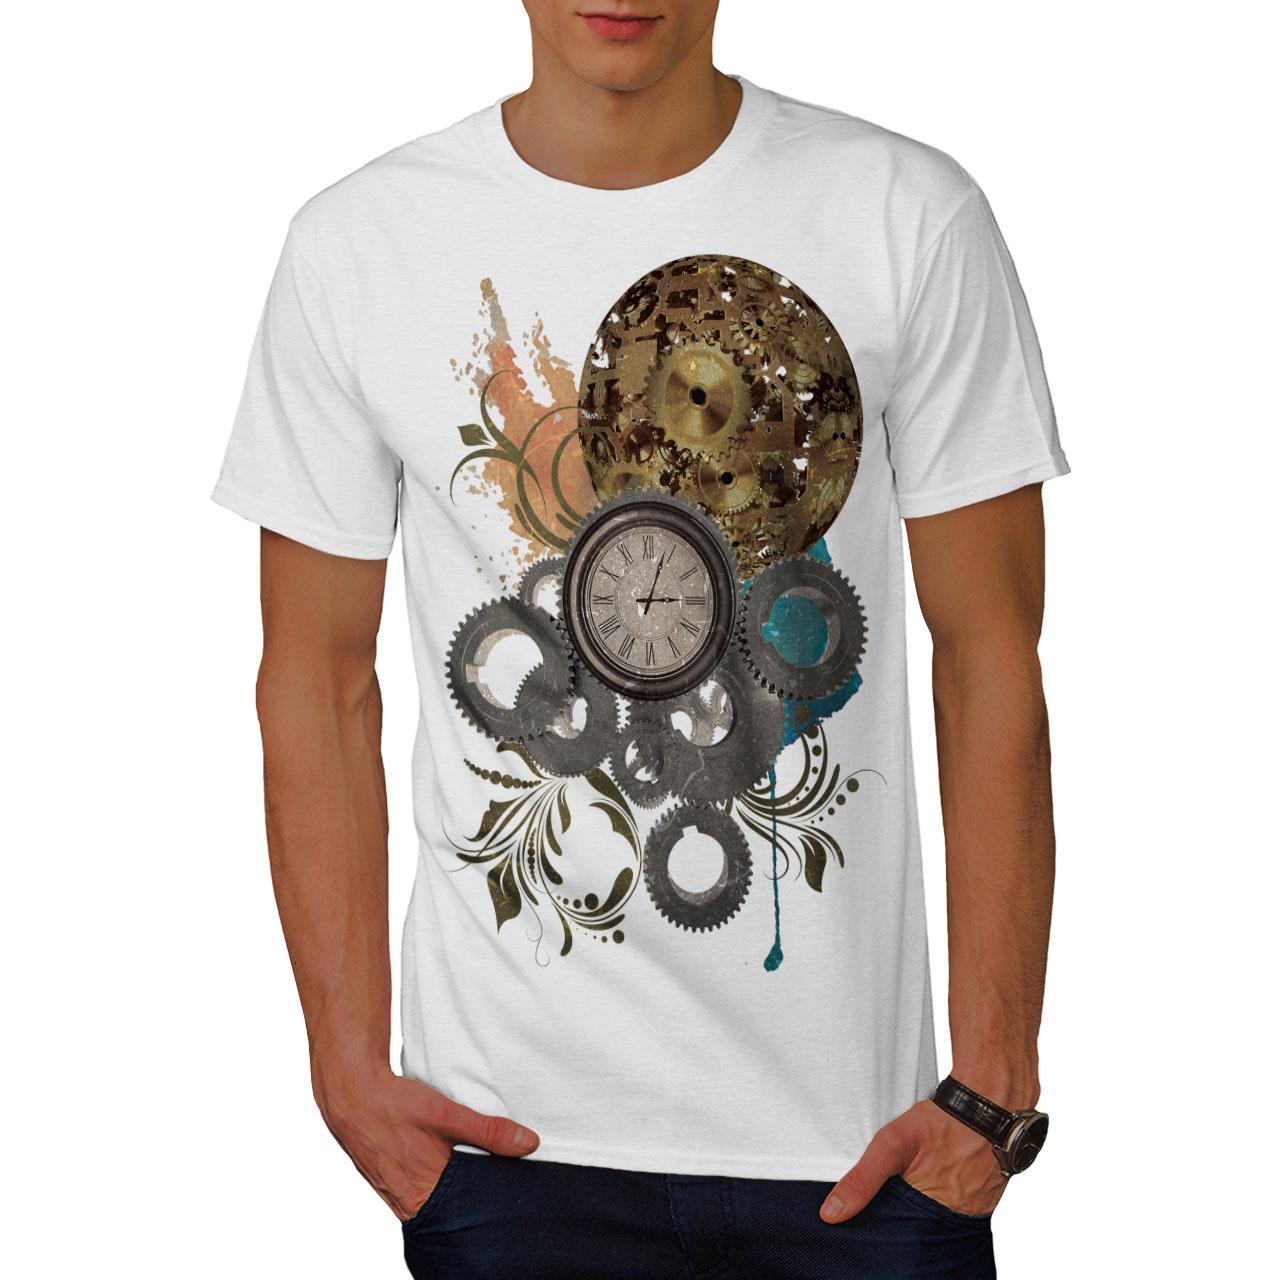 Wellcoda-Clock-Cool-Print-Mens-T-shirt-Illusion-Graphic-Design-Printed-Tee